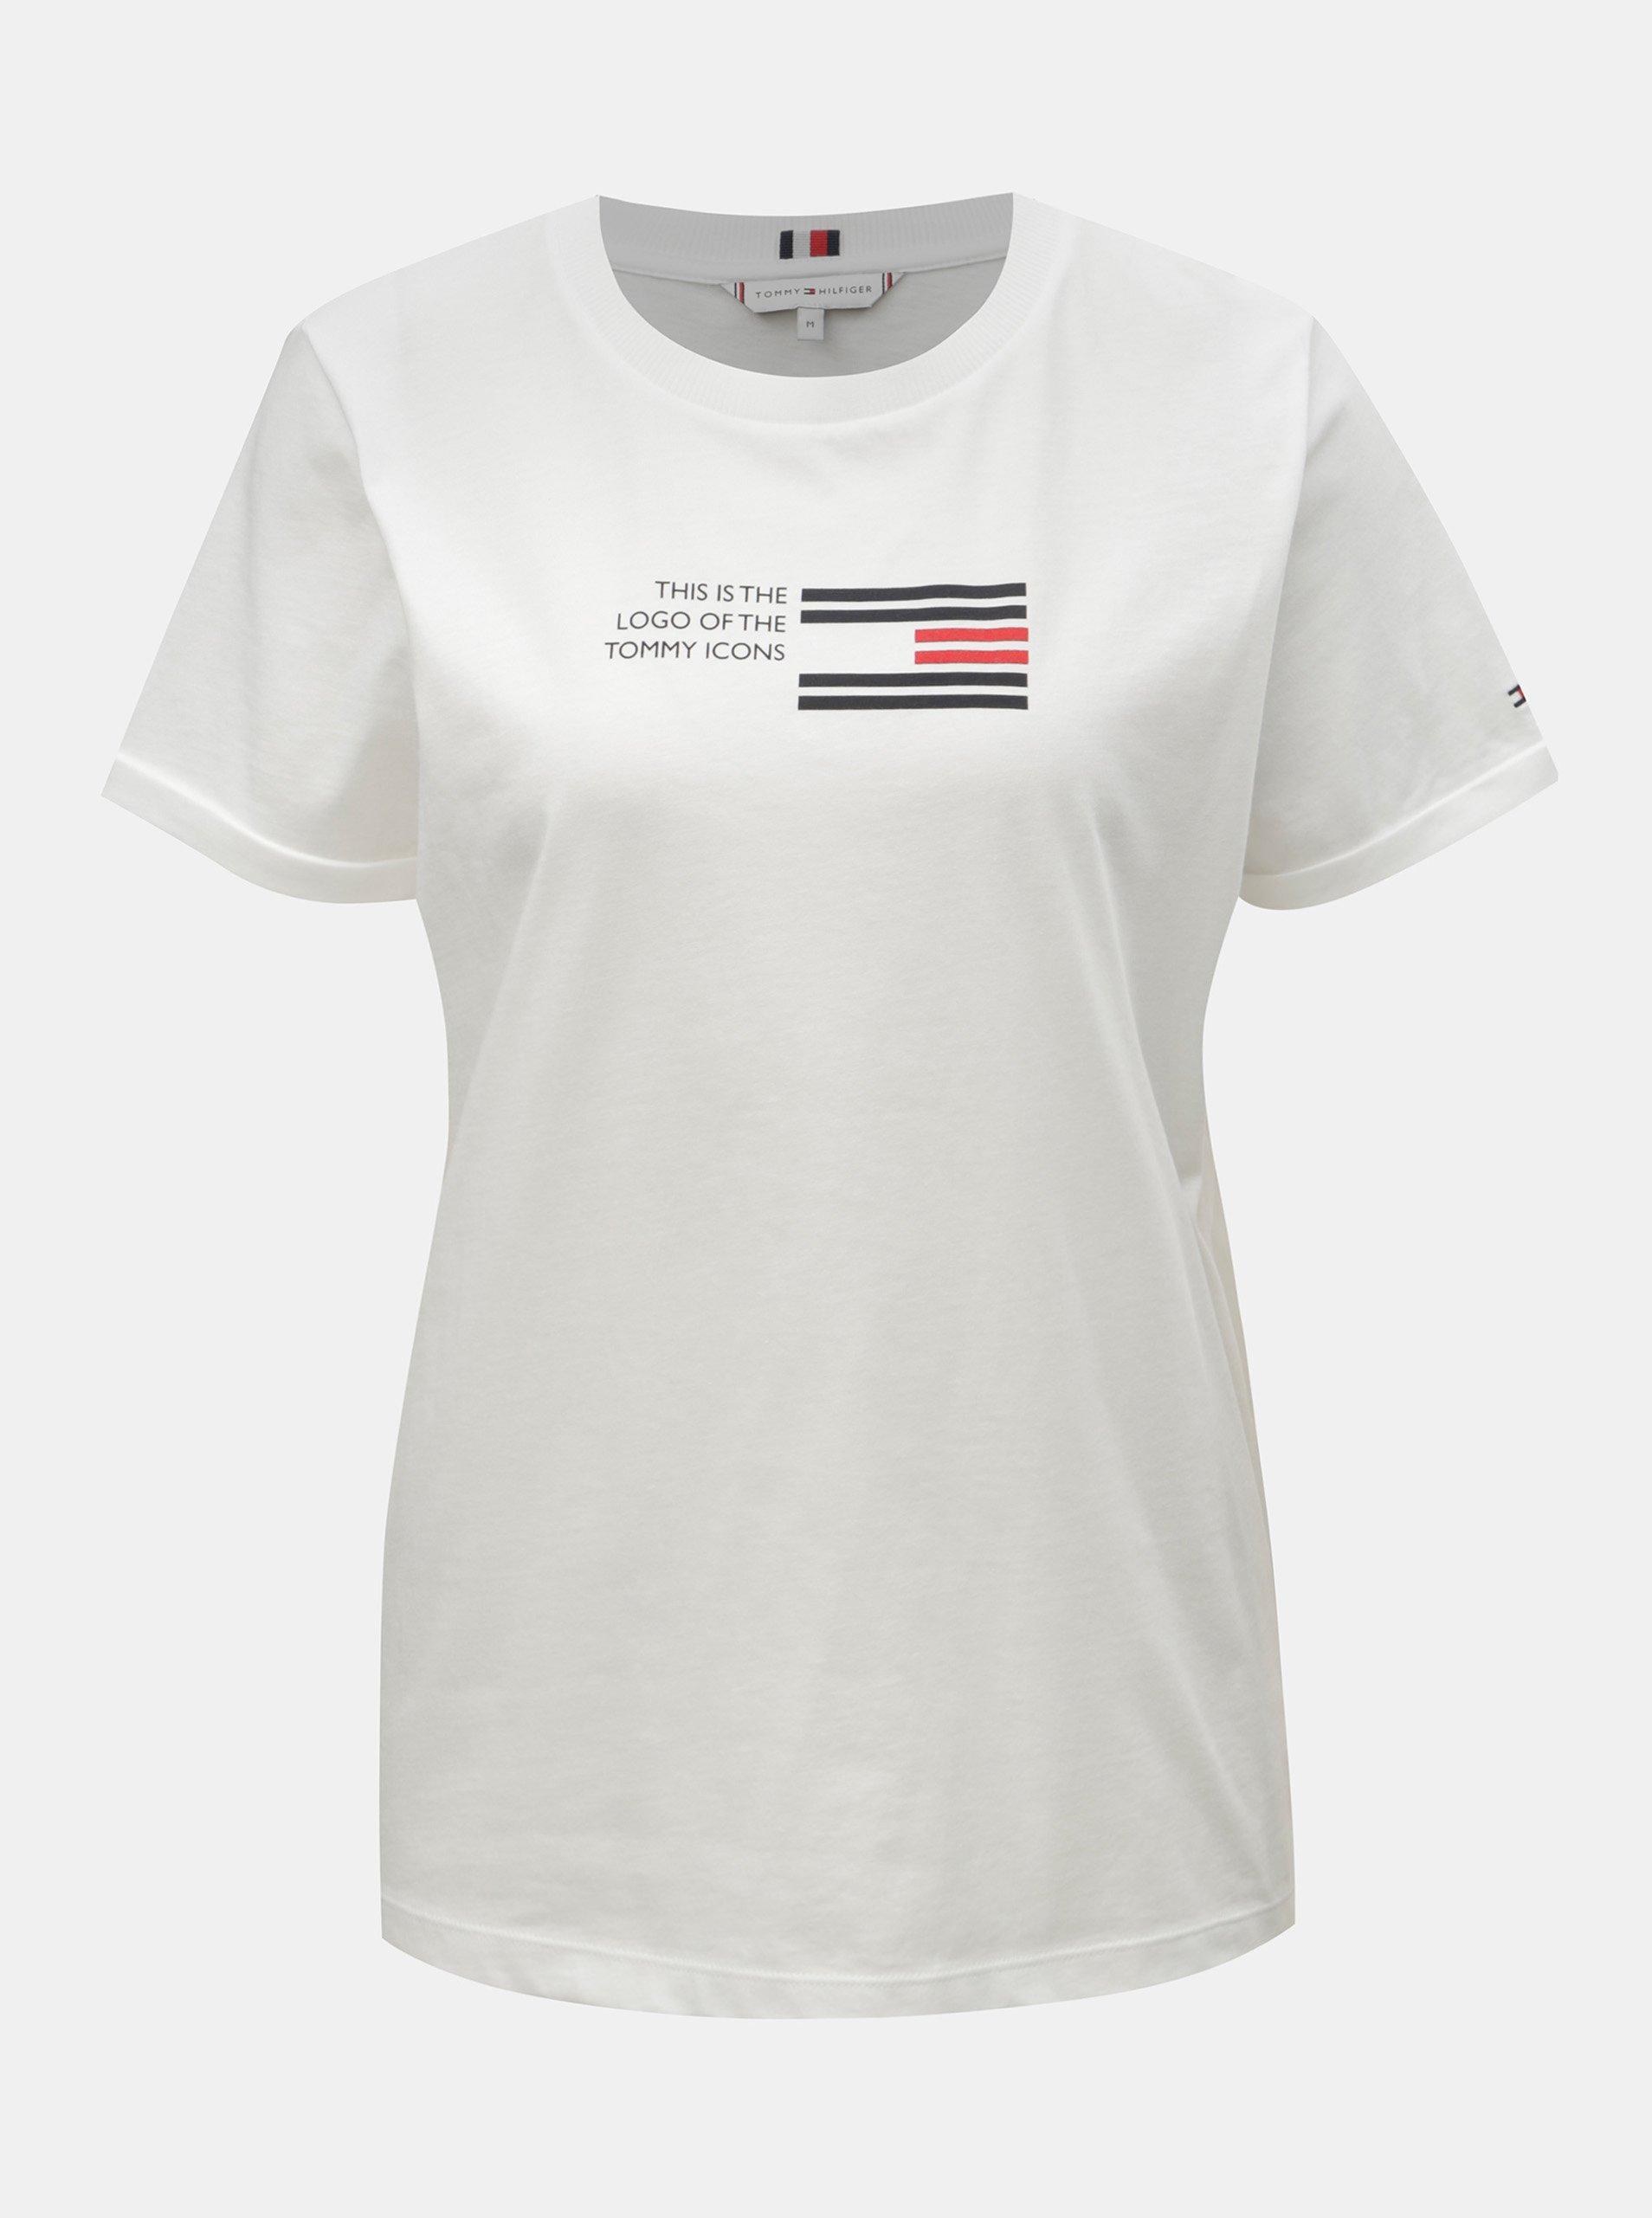 fbff689ec Biele dámske tričko s potlačou Tommy Hilfiger